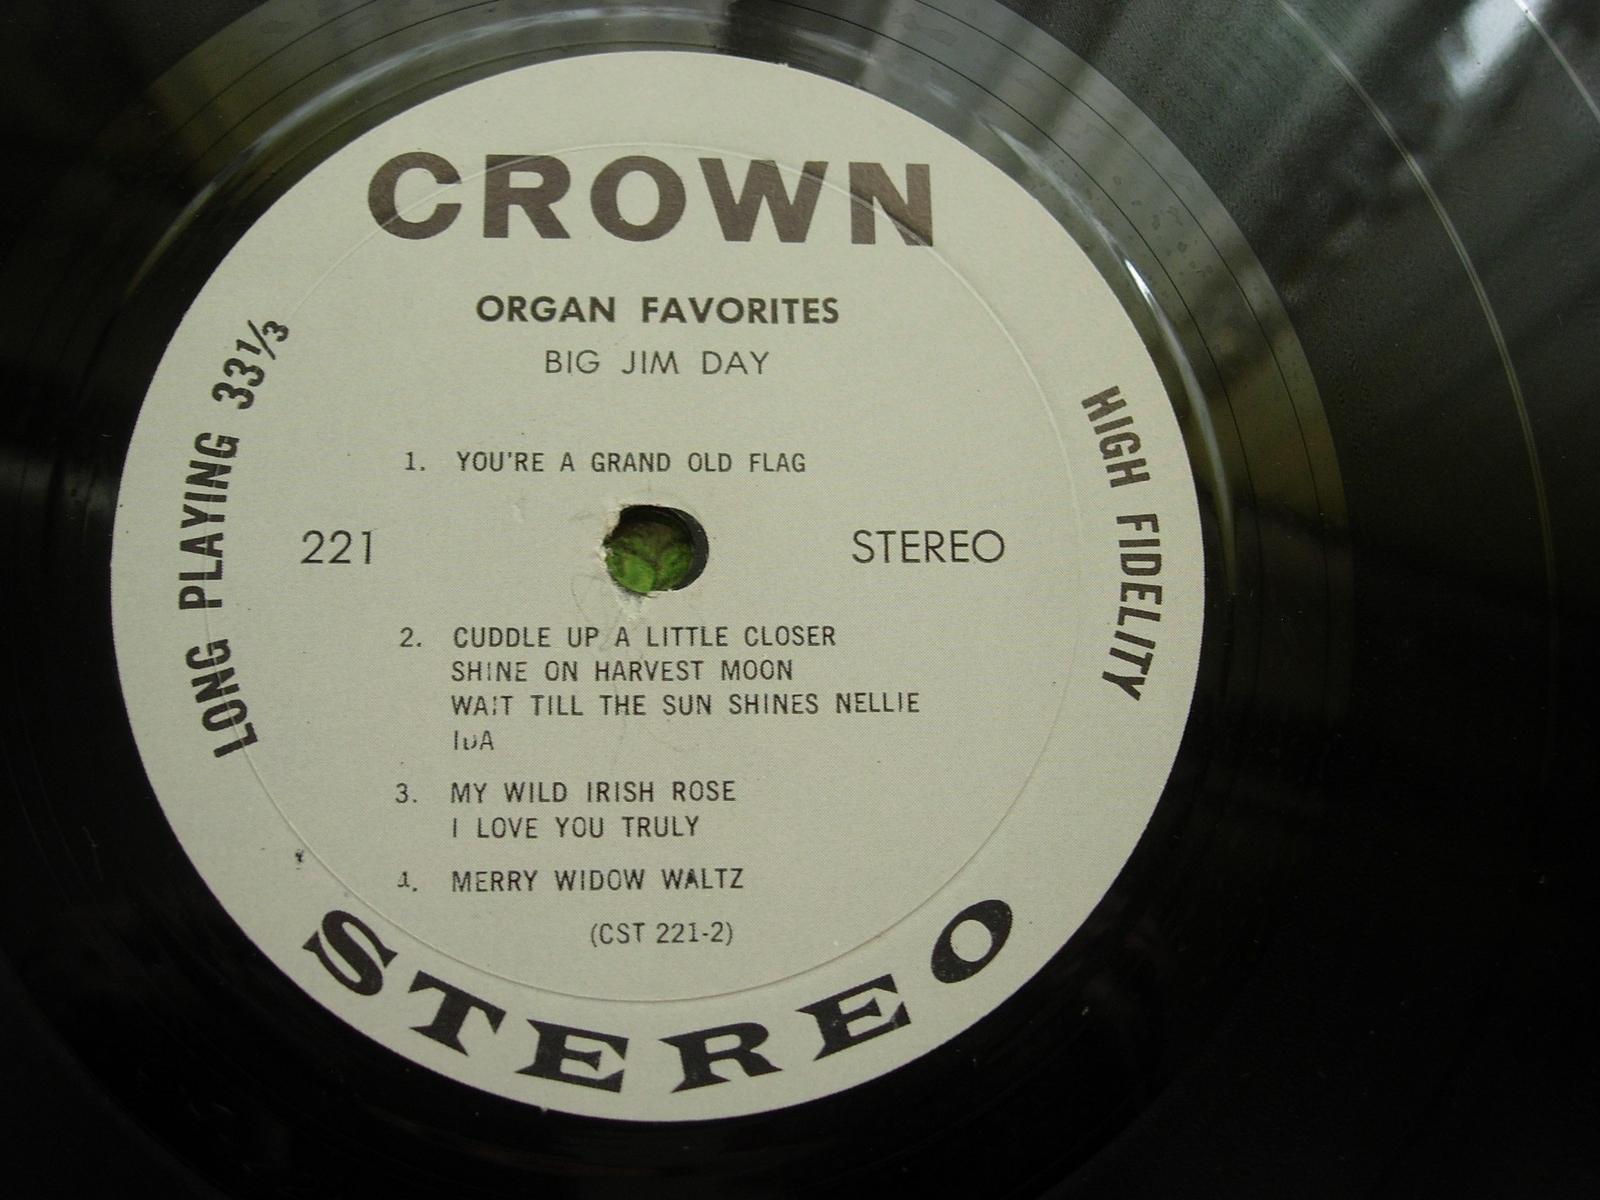 Jim Day - Organ Favorites - Crown Records CST 221